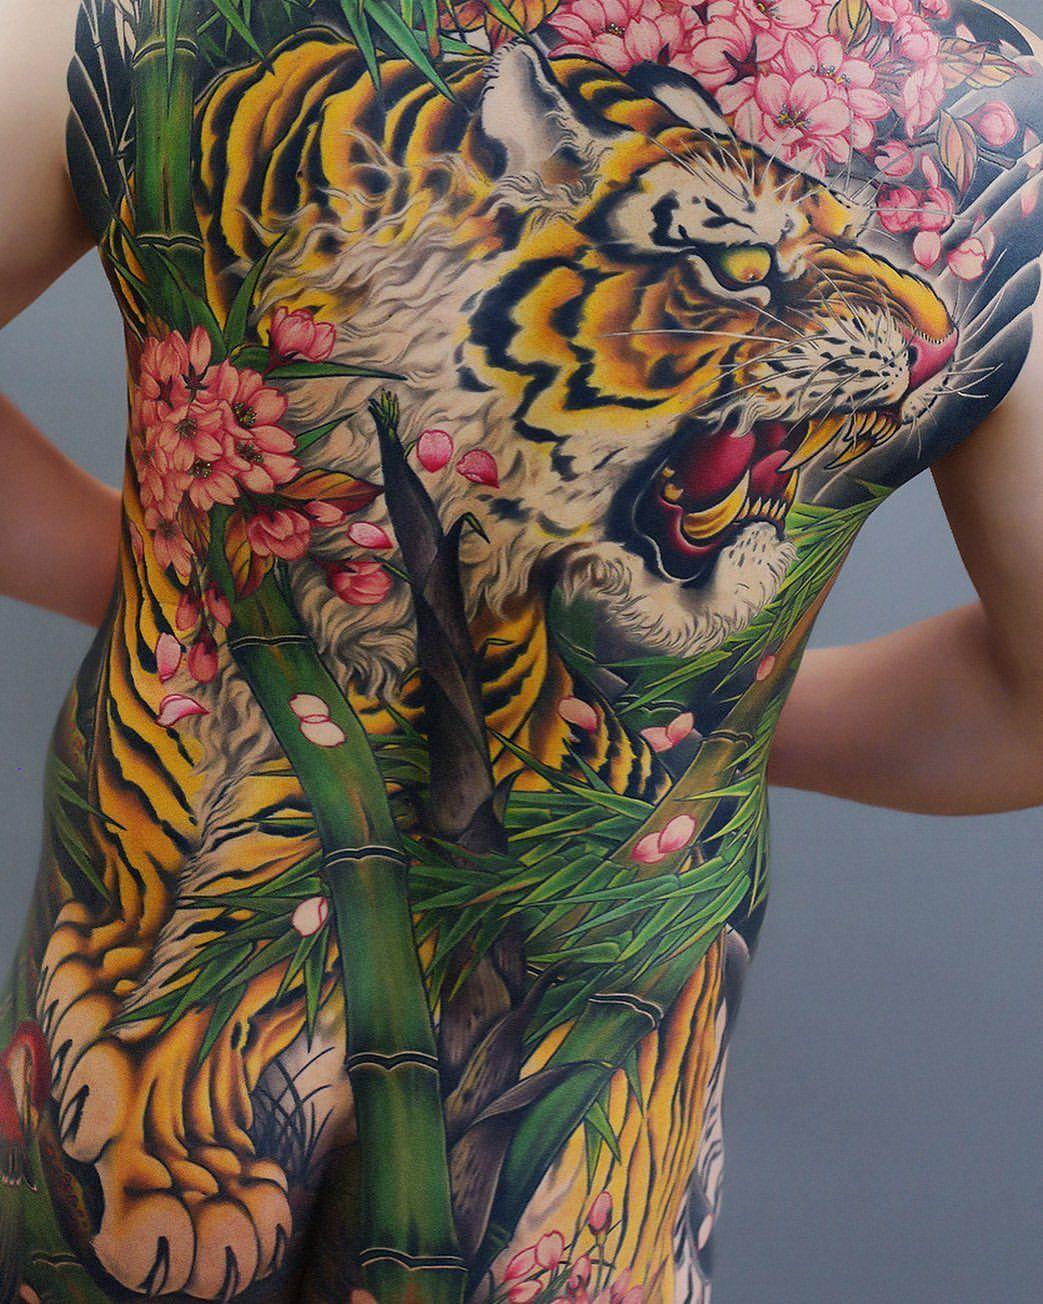 #tigertattoo #tiger #birdtattoo #redbird #tora #bambootattoo #cherryblossom #colorworktattoo #japanesetattoo #irezumi #鳥 #虎 #猛虎 #竹 #桜 #背中一面…